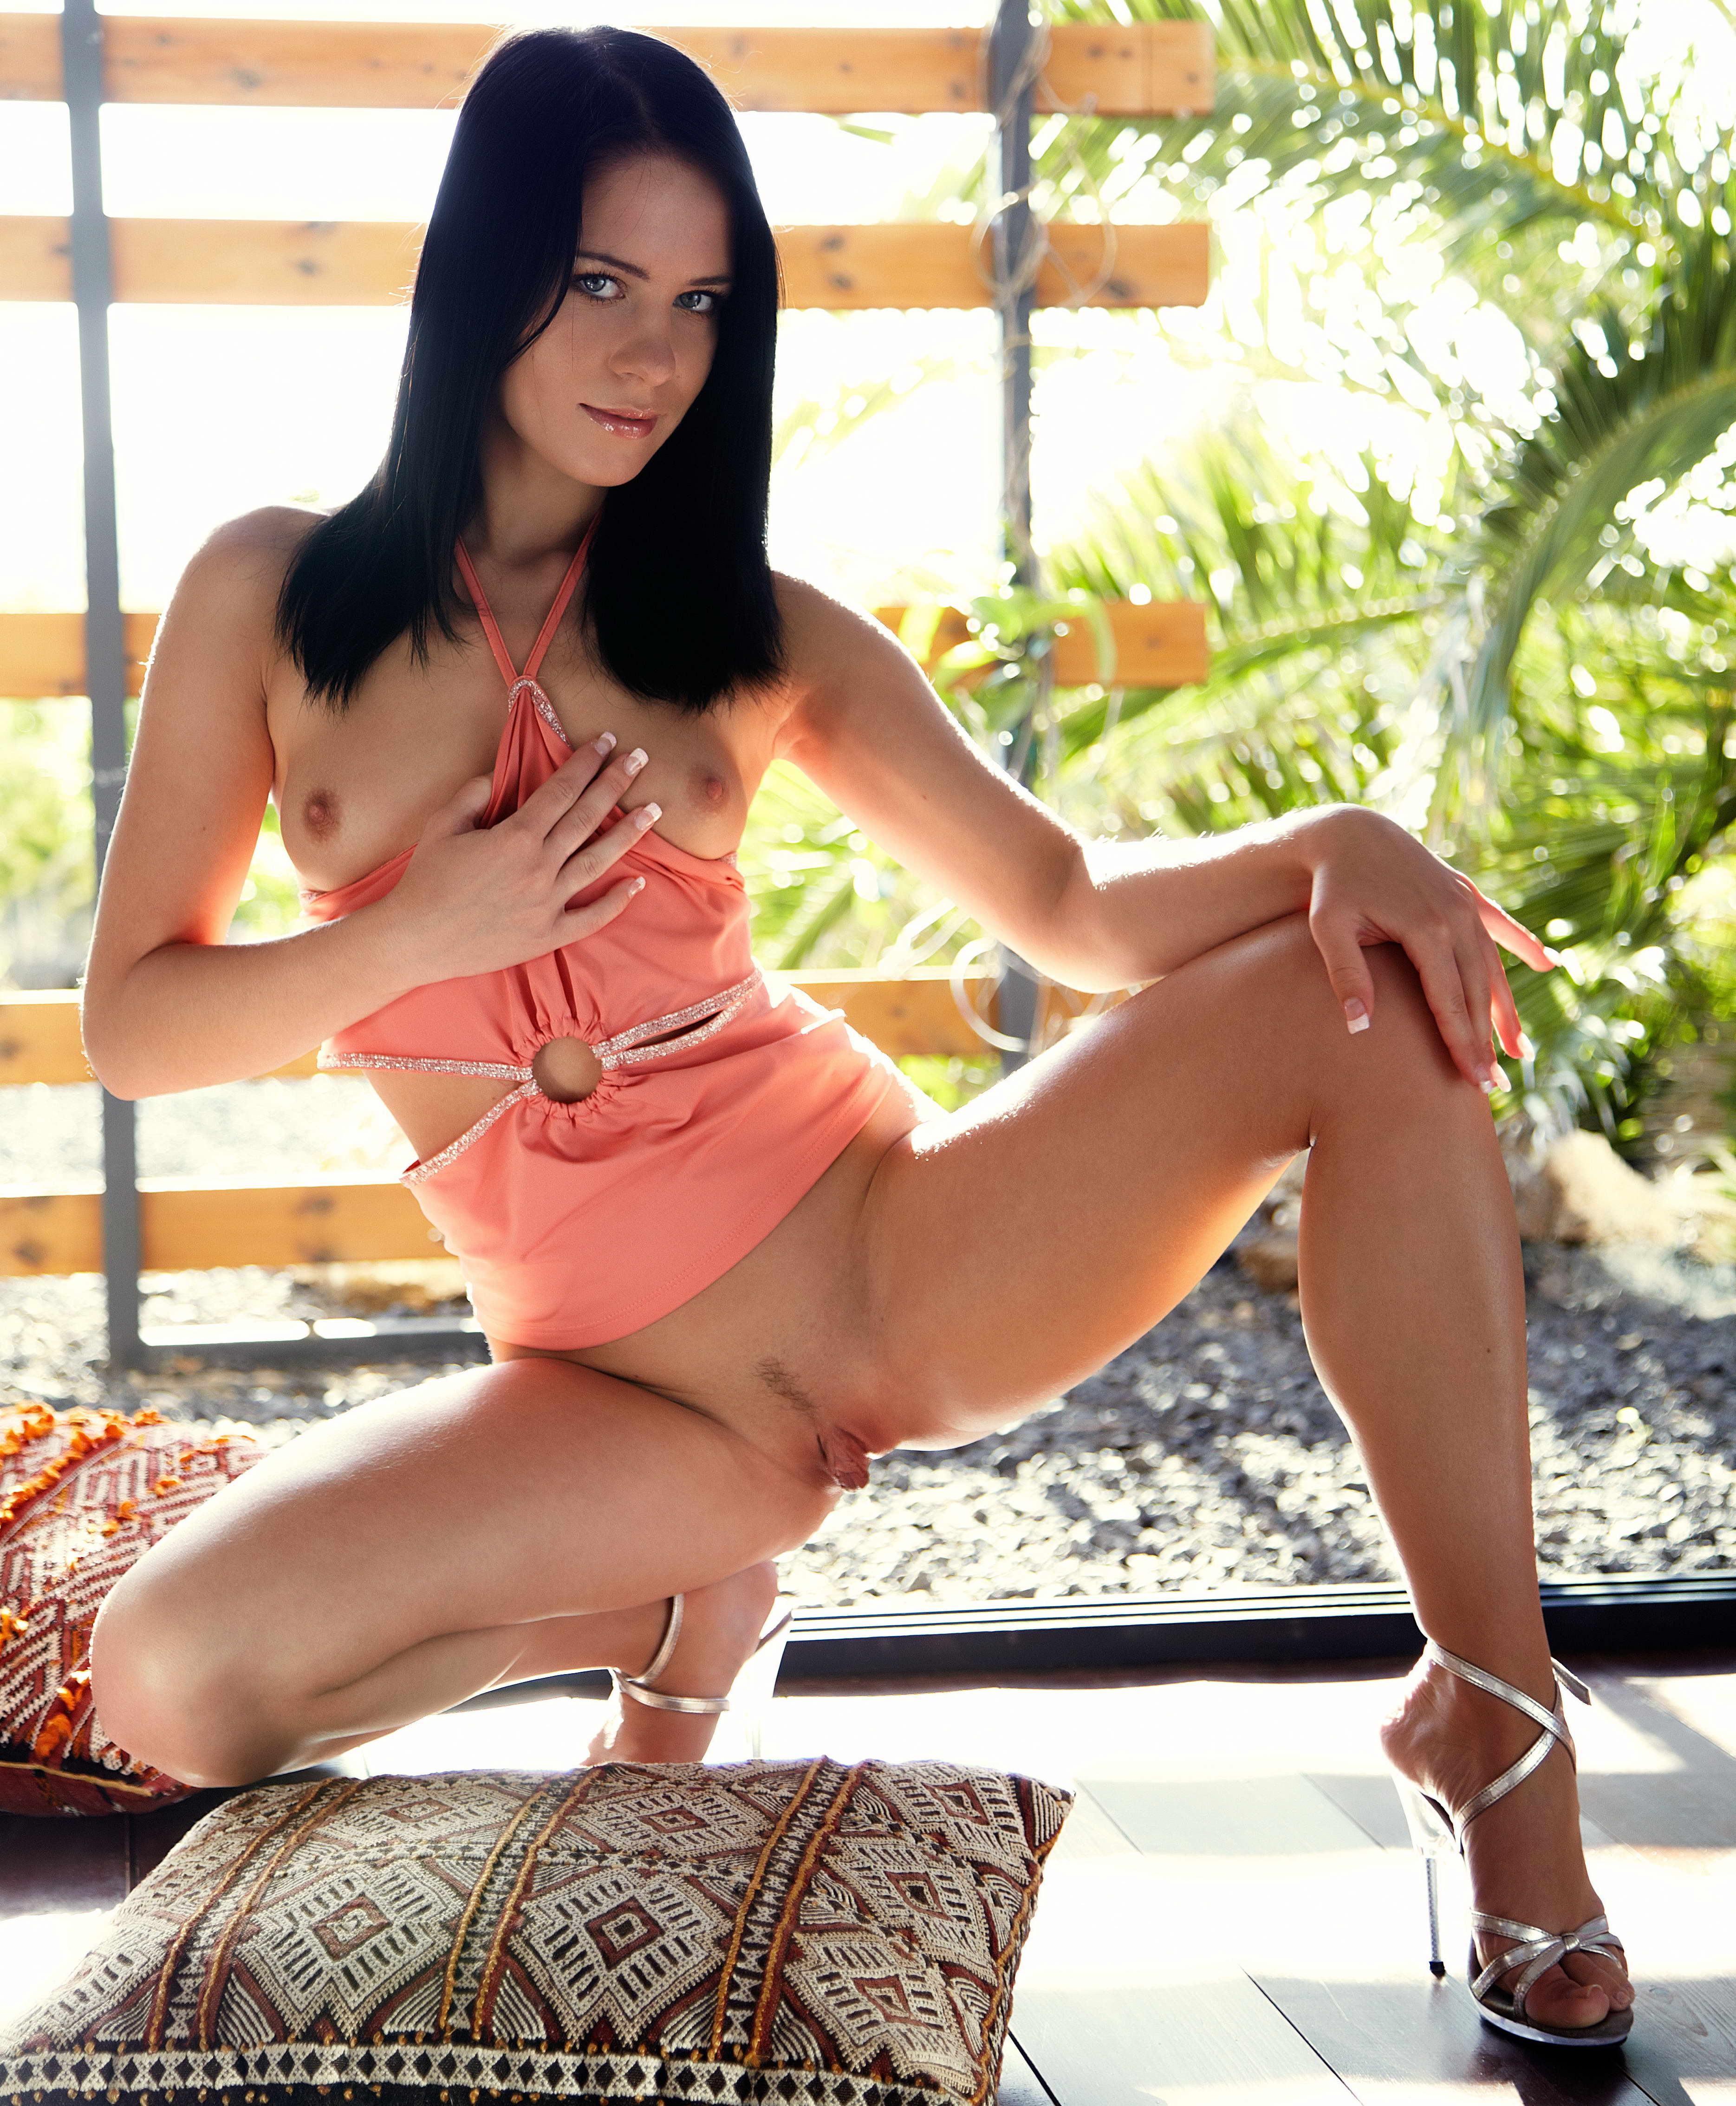 Naked Brunette - XLondonEscorts